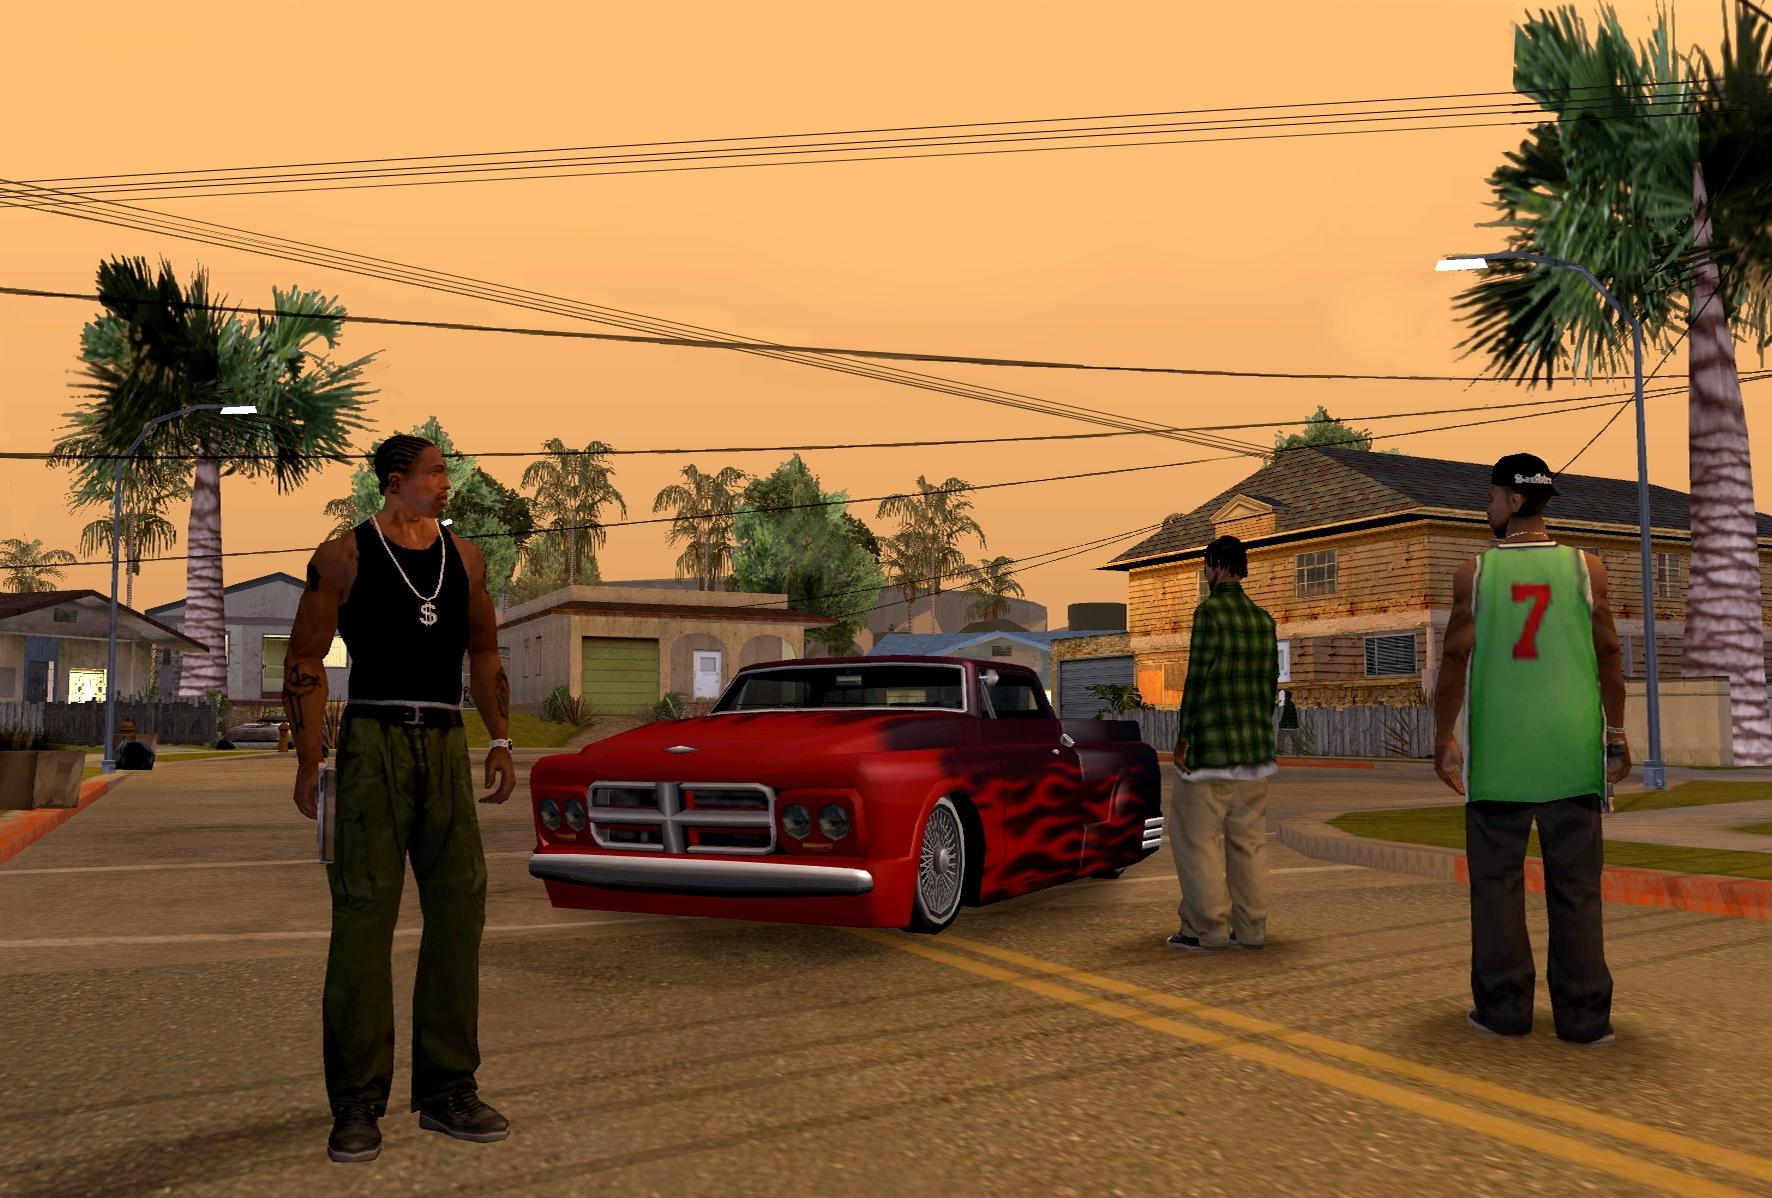 [Aporte] GTA San Andreas [Mediafire][DLC][ISO][Xbox/360]